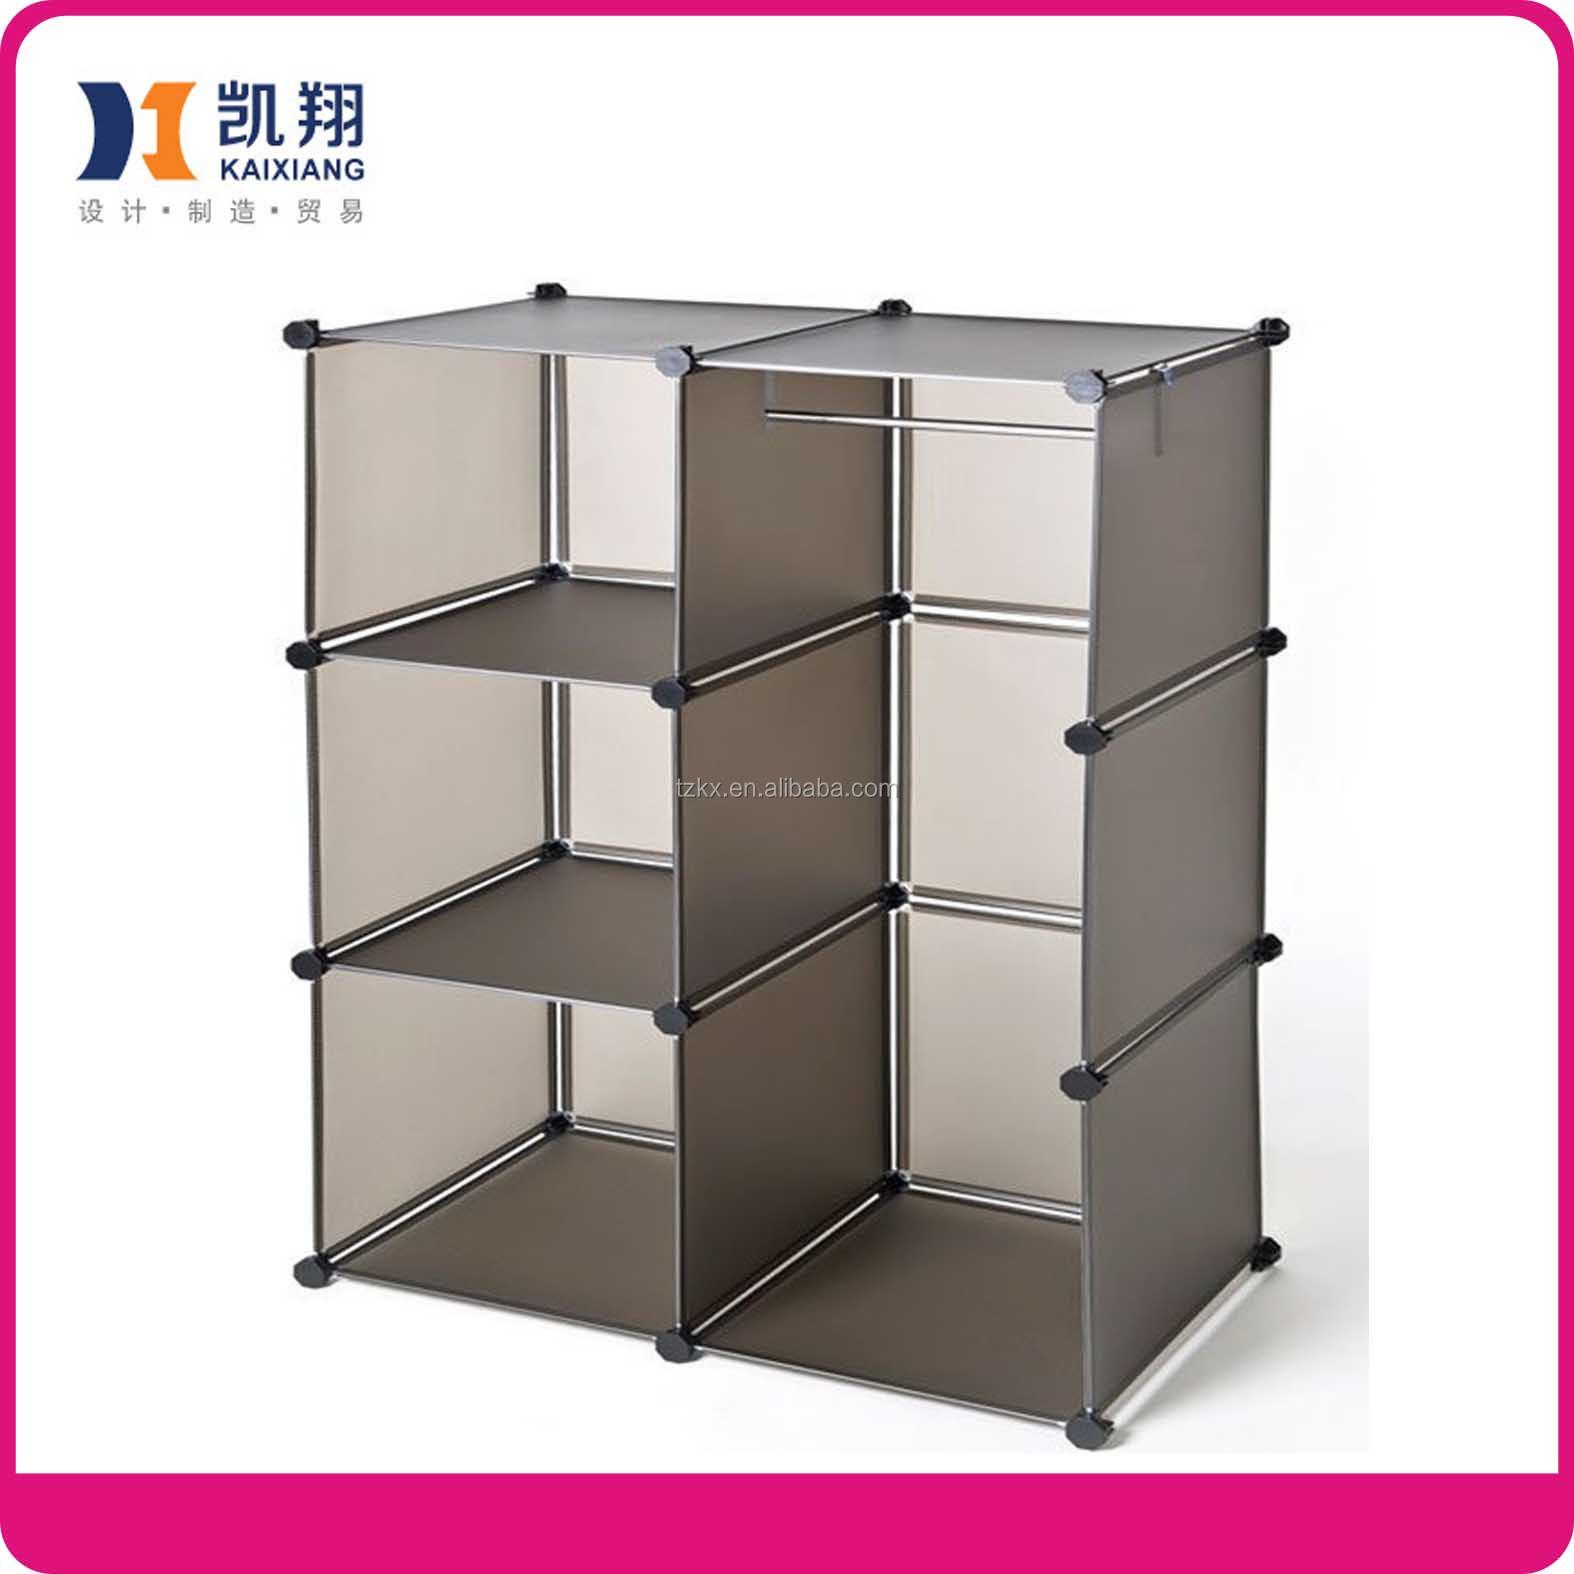 Plastic Folding Stackable Storage Cubes